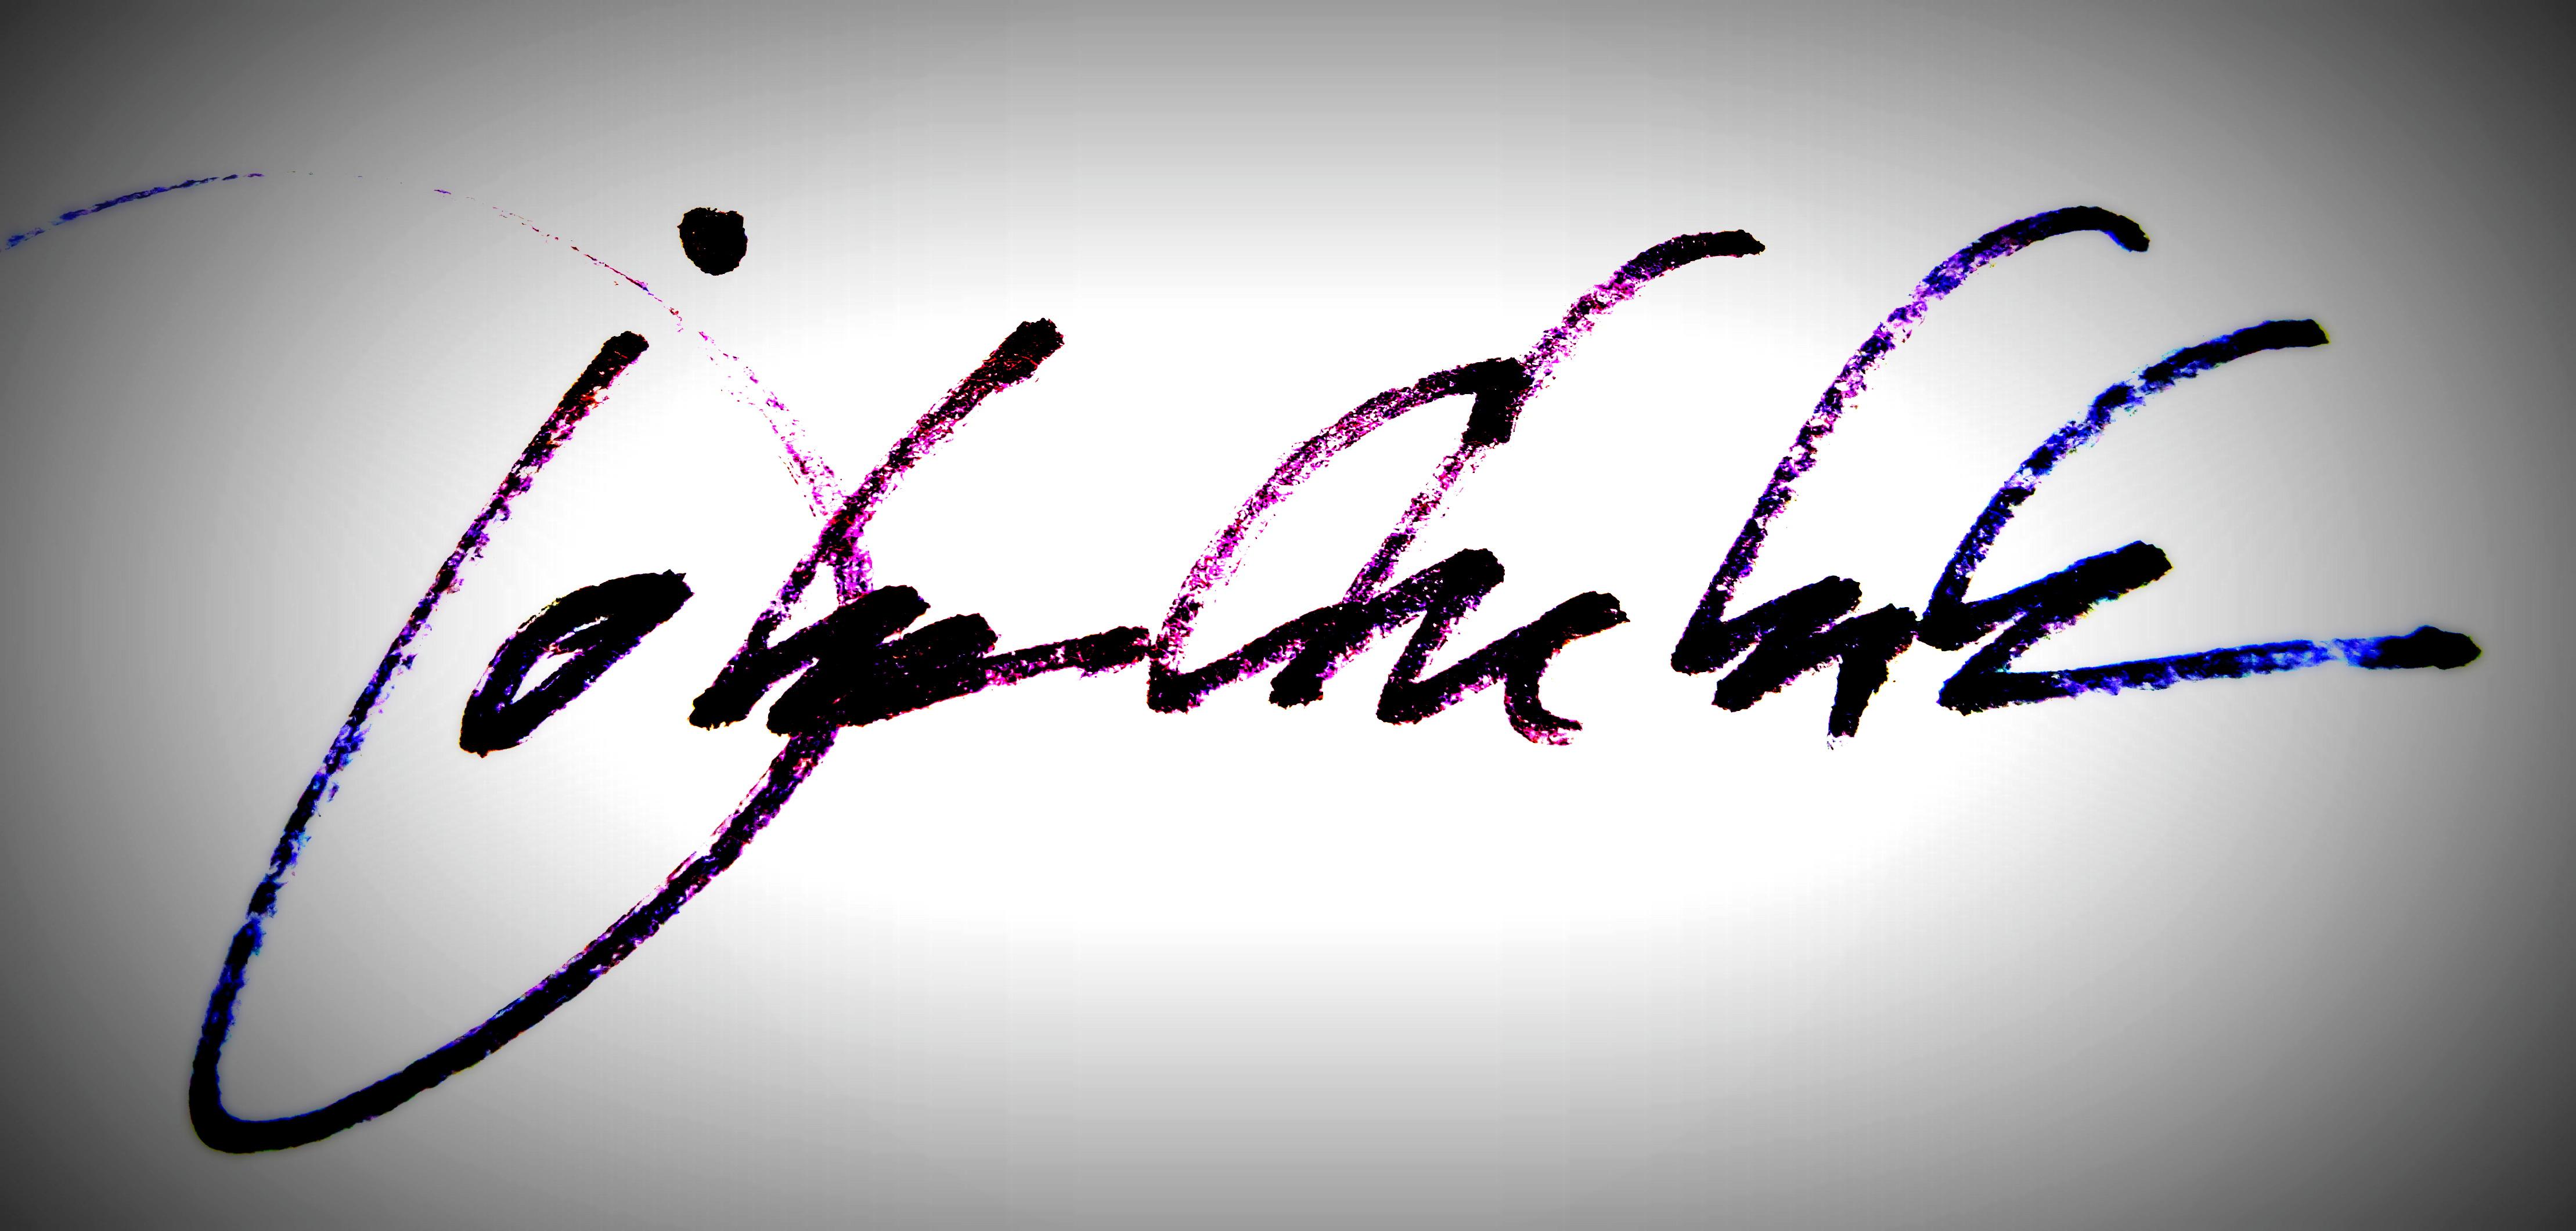 john chehak Signature